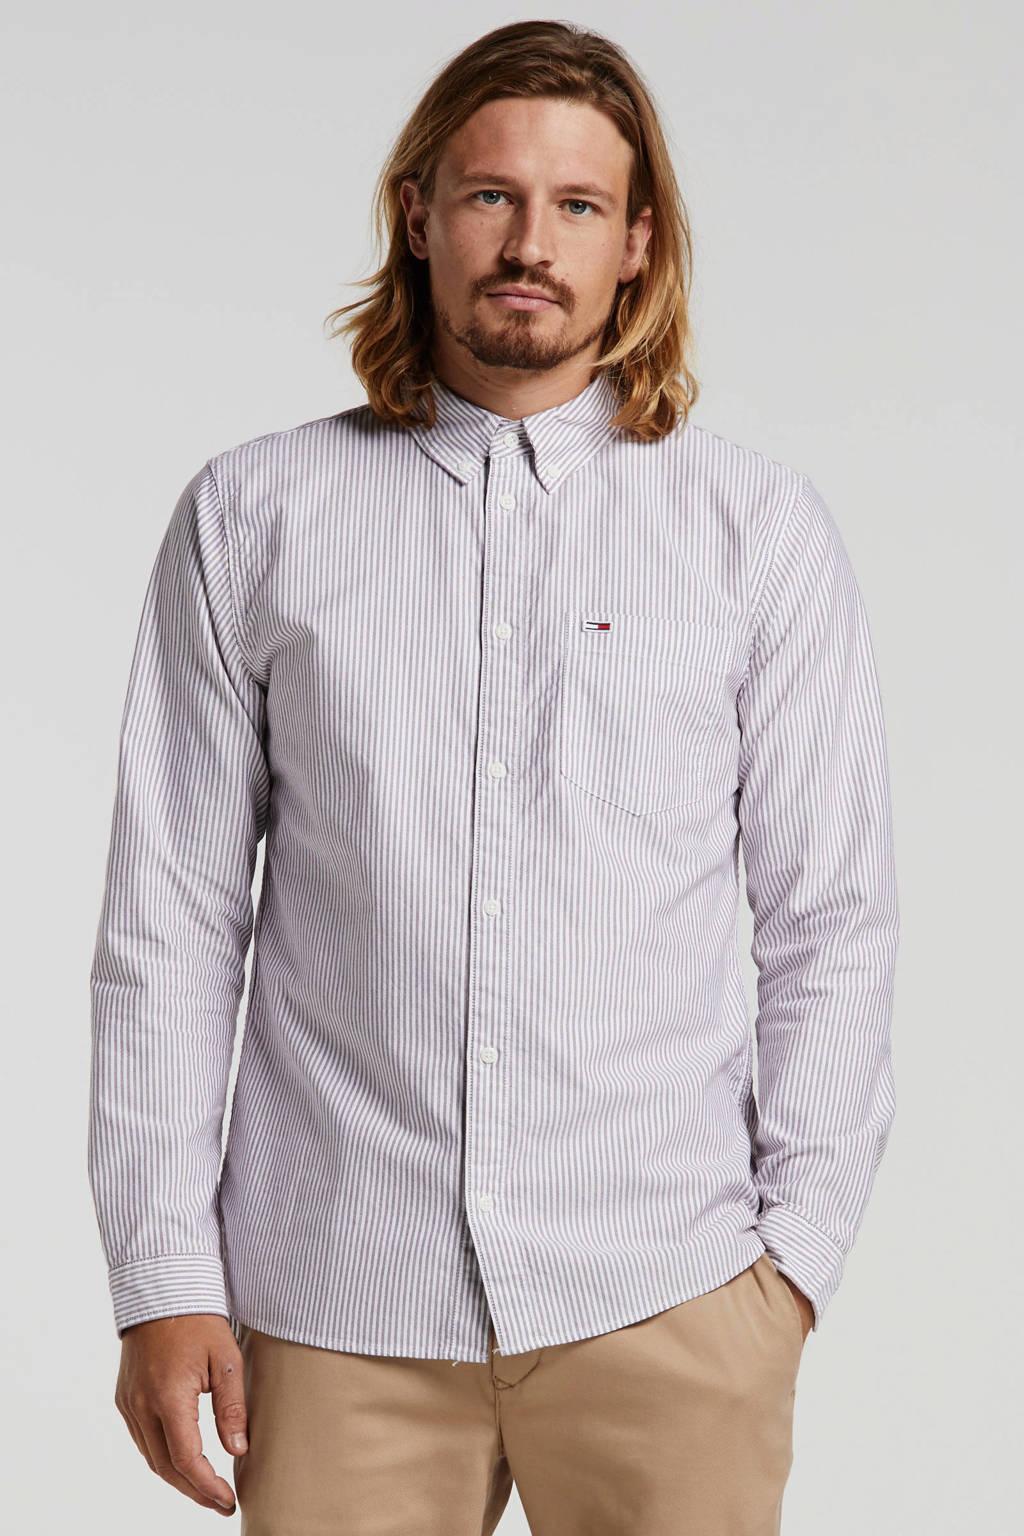 Tommy Jeans gestreept regular fit overhemd van biologisch katoen wit/oudroze, Wit/oudroze